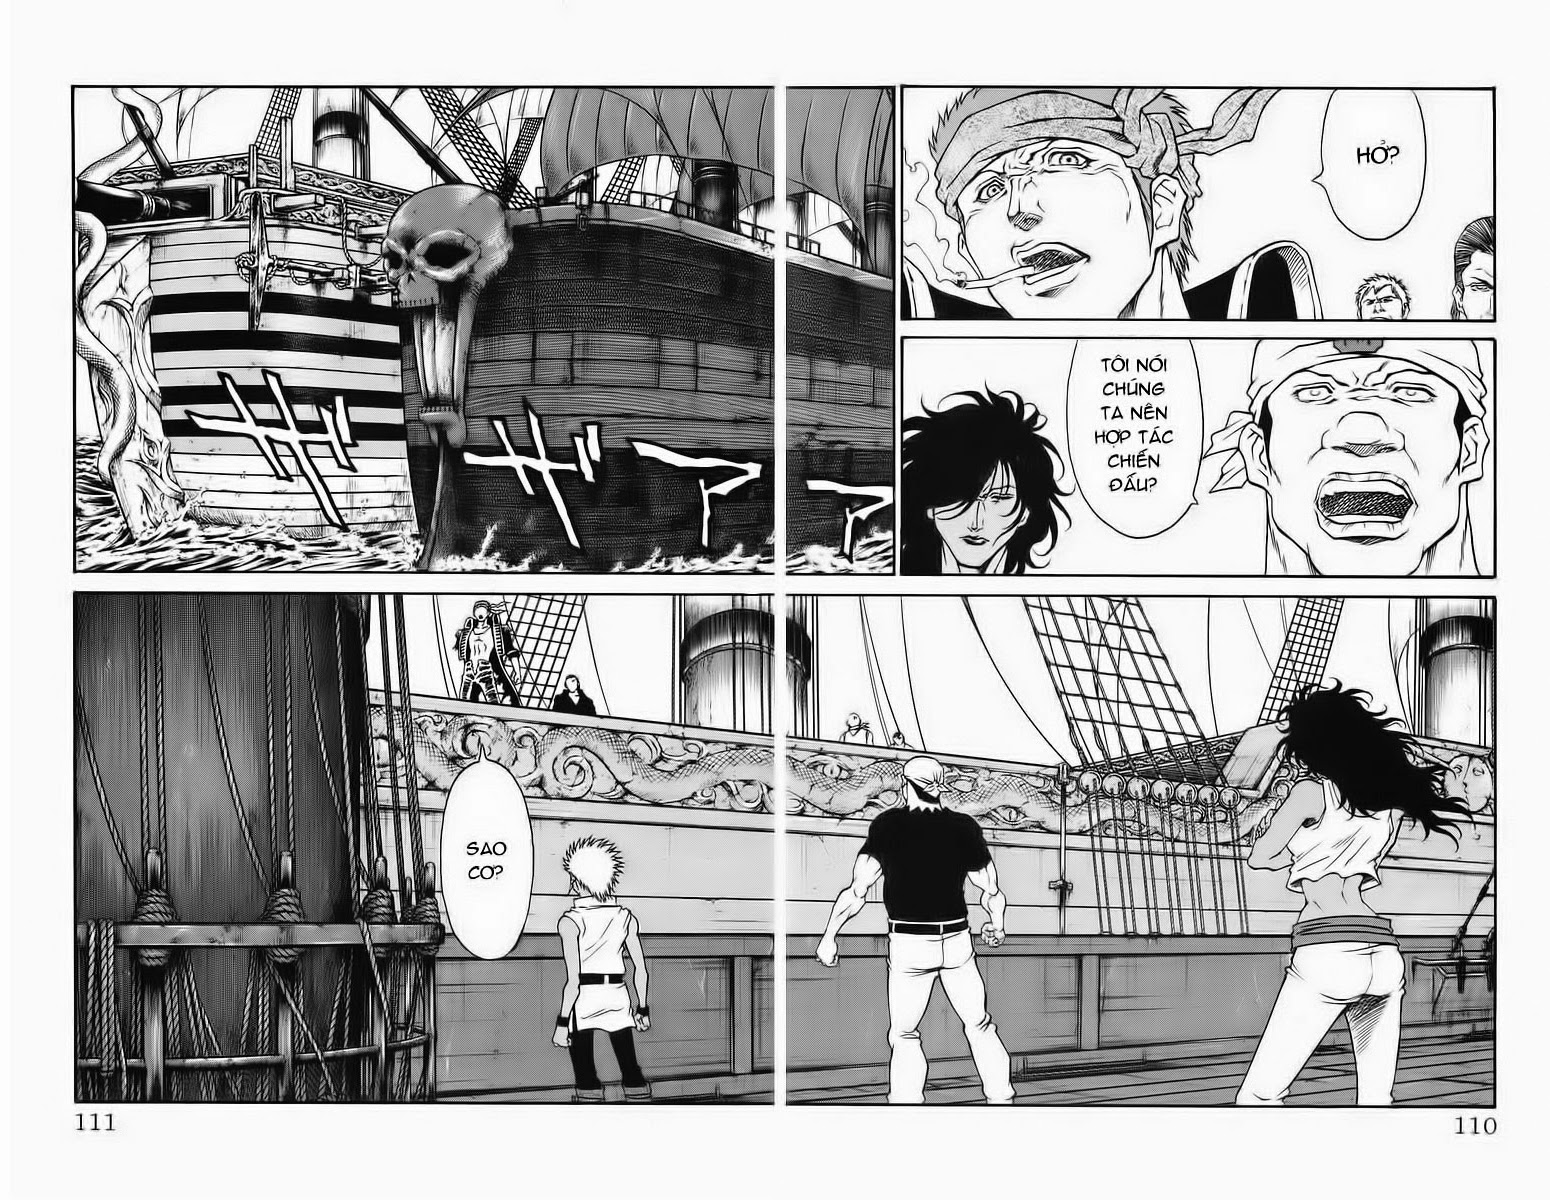 Vua Trên Biển – Coco Full Ahead chap 228 Trang 3 - Mangak.info